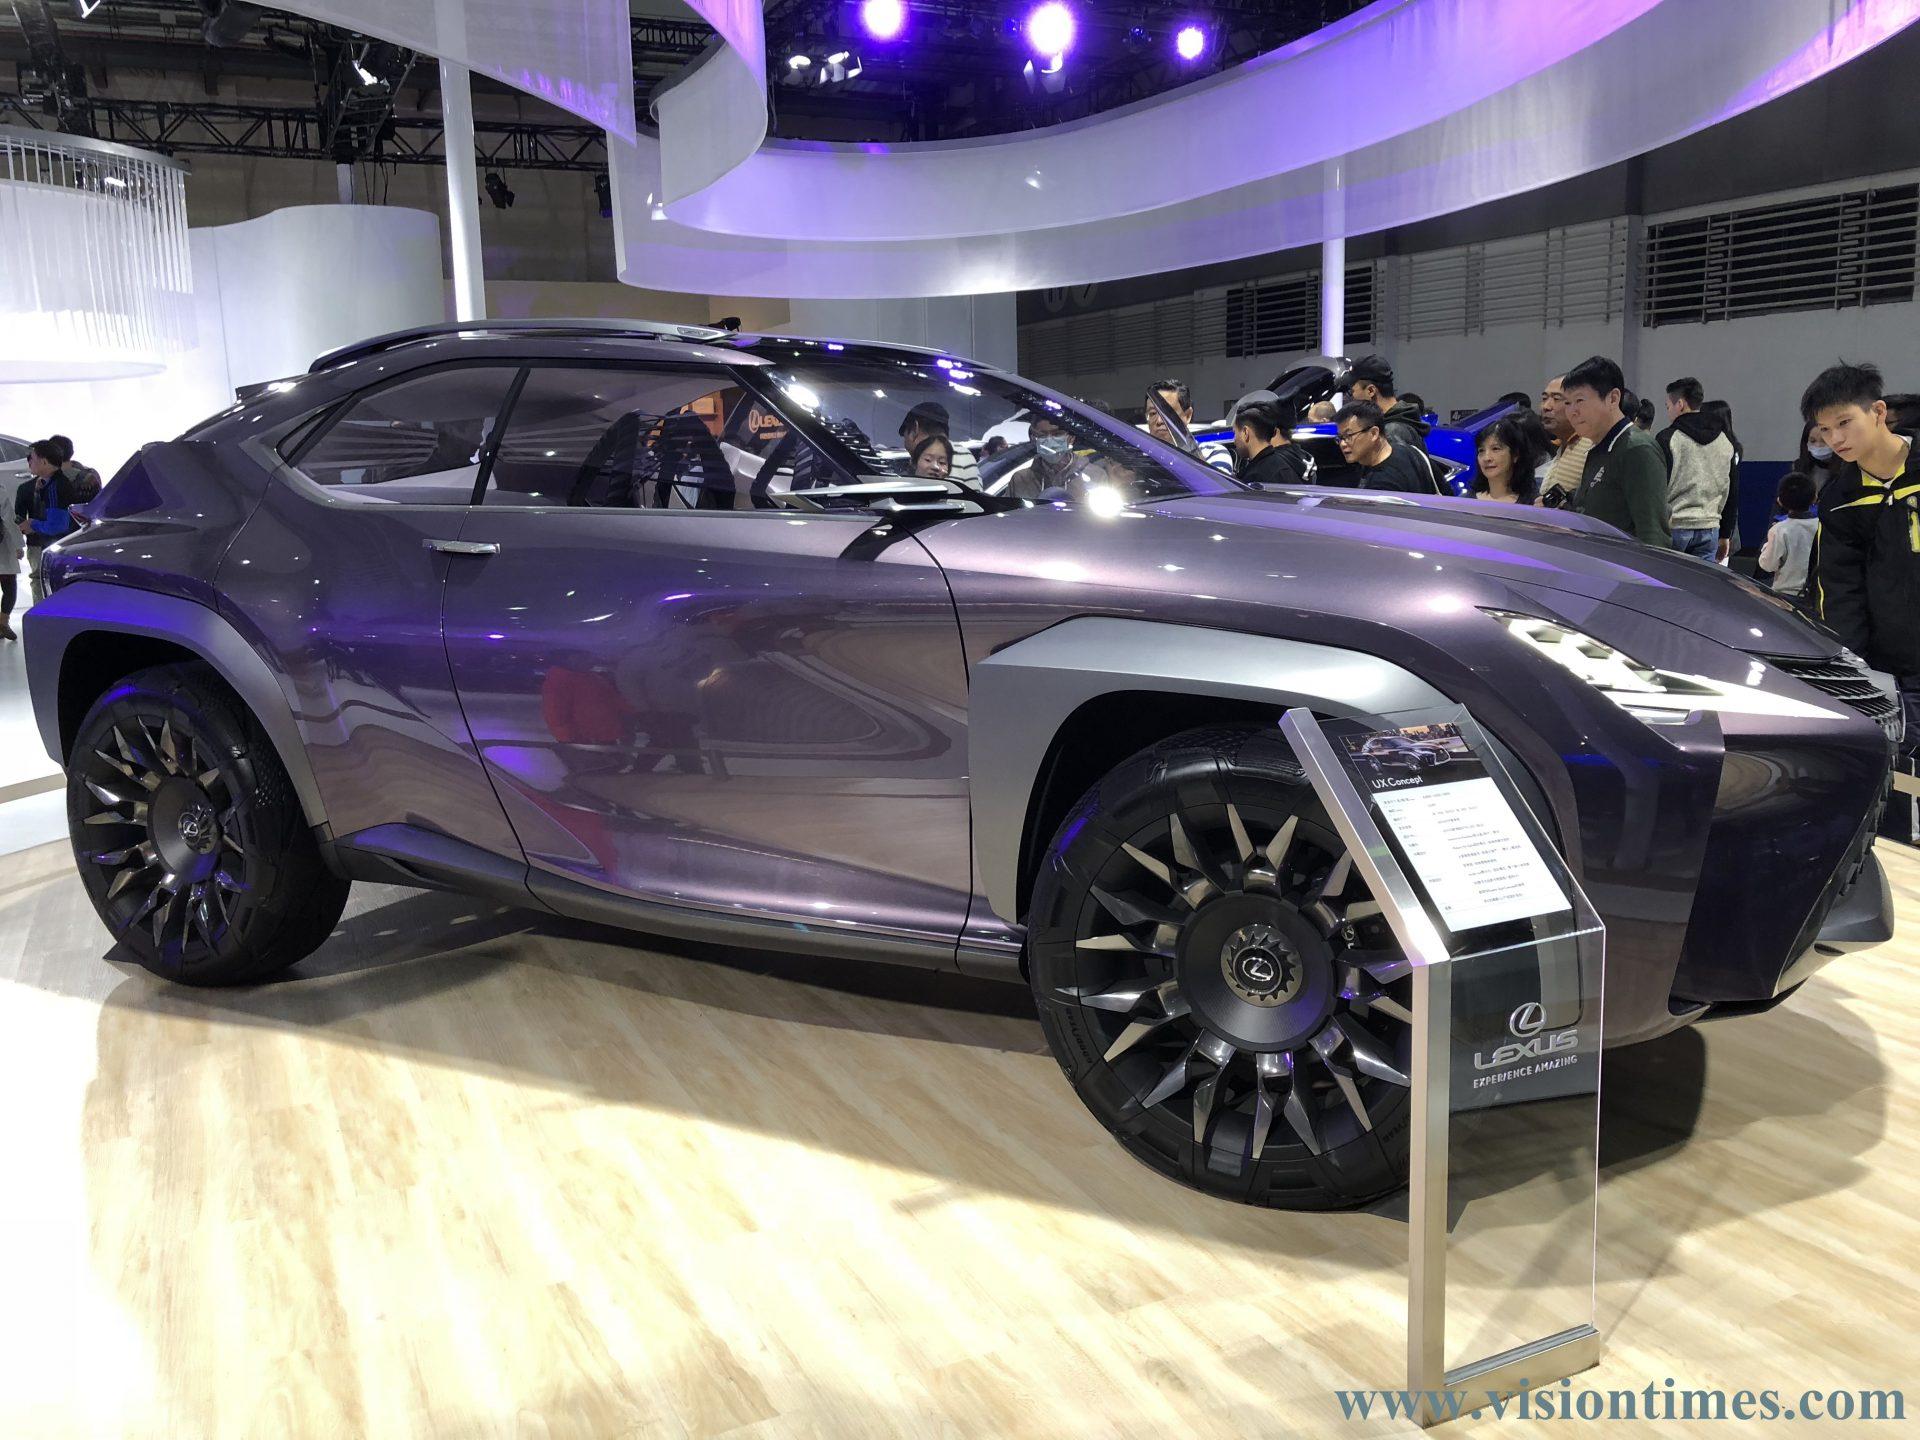 Lexus UX Concept vehicle at the 2018 Taipei International Auto Show. (Image: Billy Shyu)